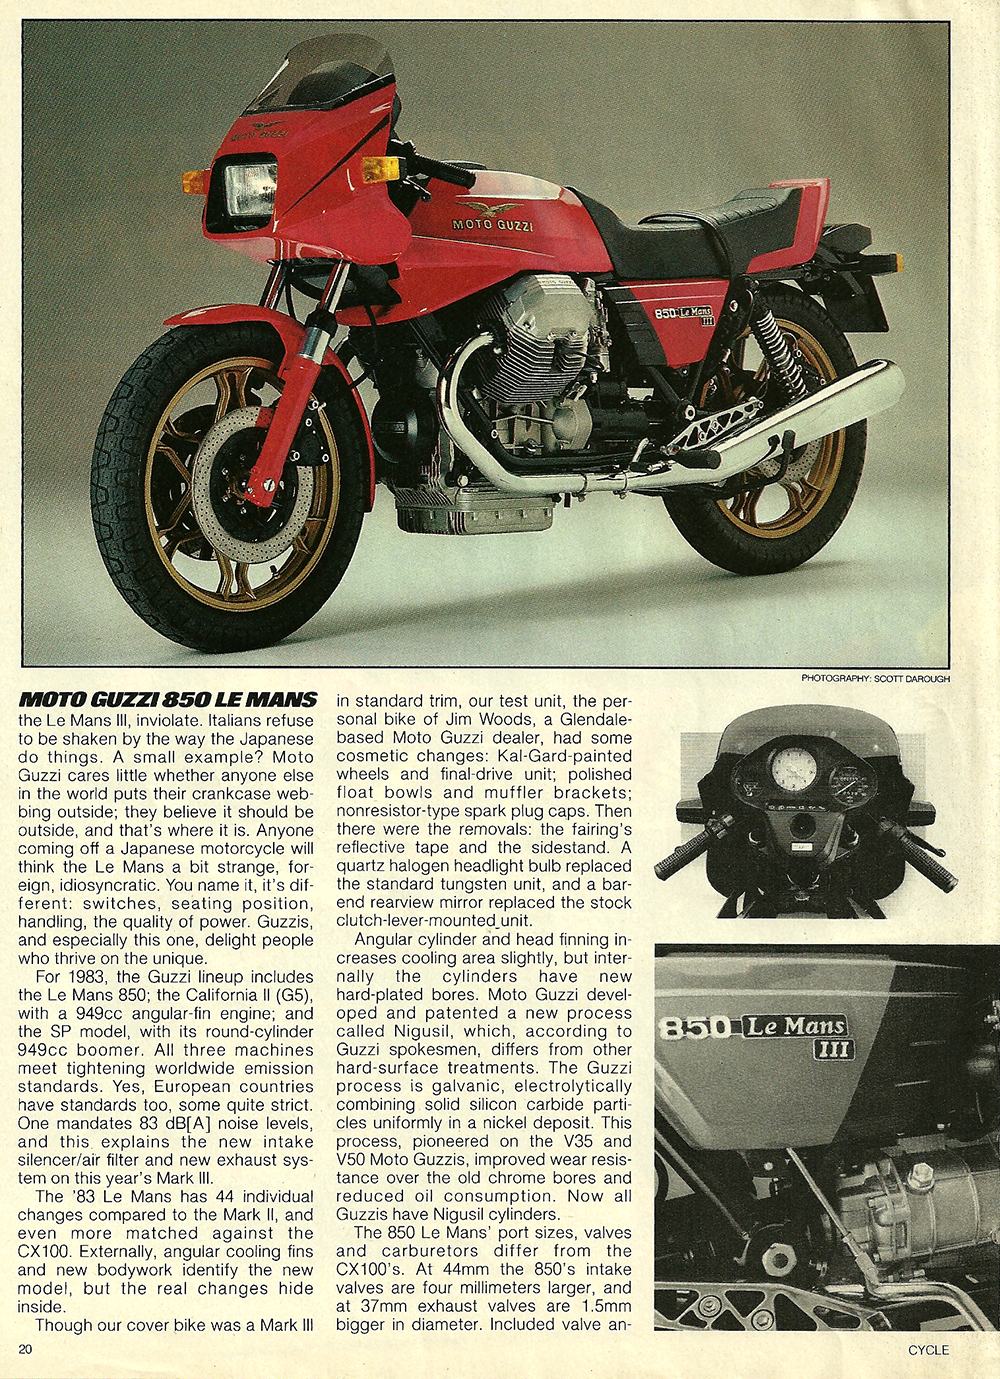 1983 Moto Guzzi 850 Lemans 3 road test 3.jpg